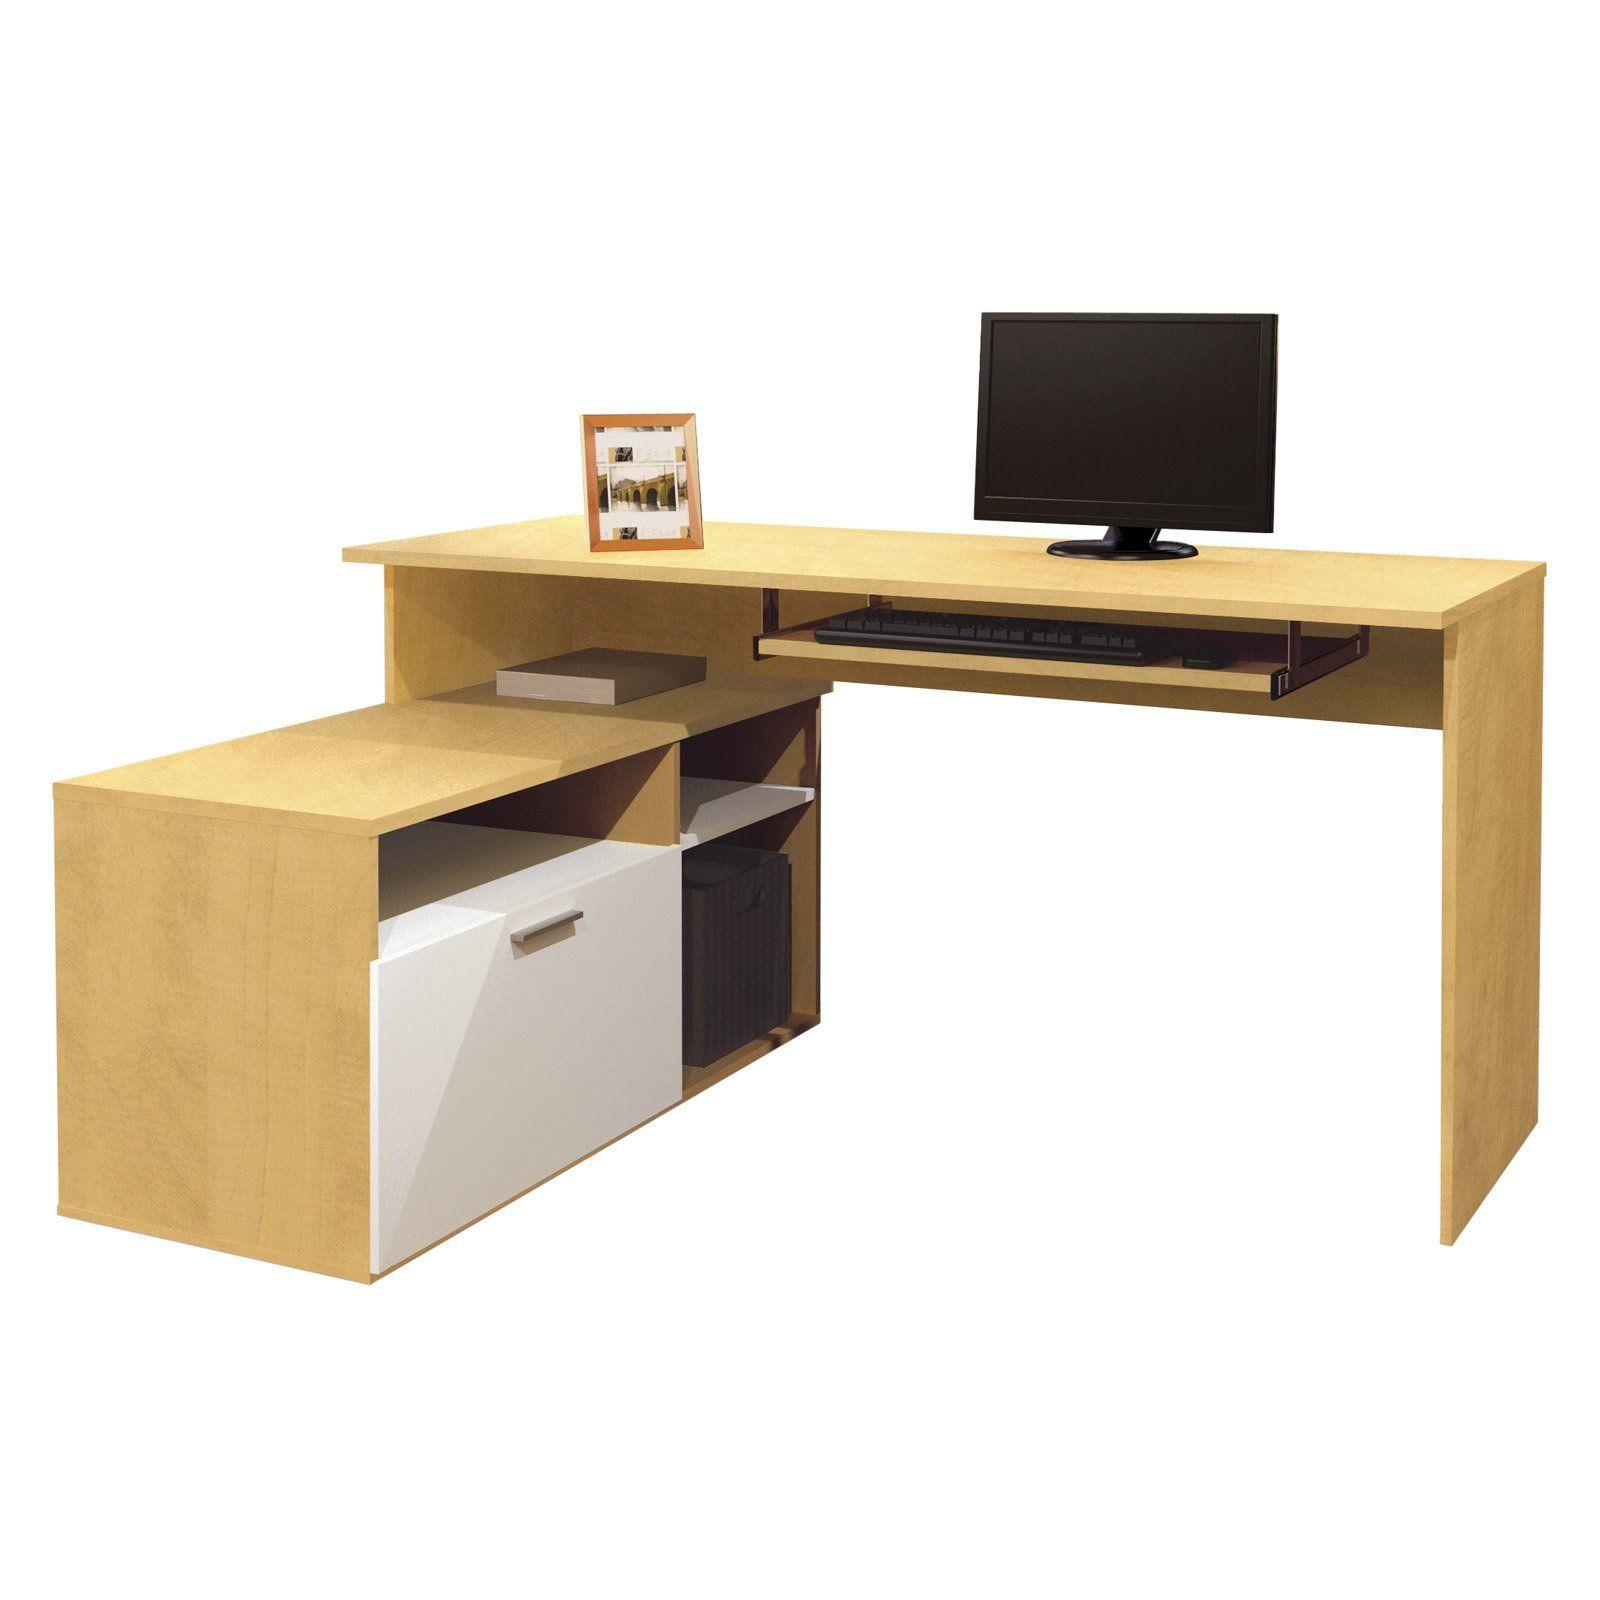 Bestar Modula L Shaped Workstation 335 99 Home Office Furniture Small Office Furniture Office Furniture Sale Small computer desks for sale